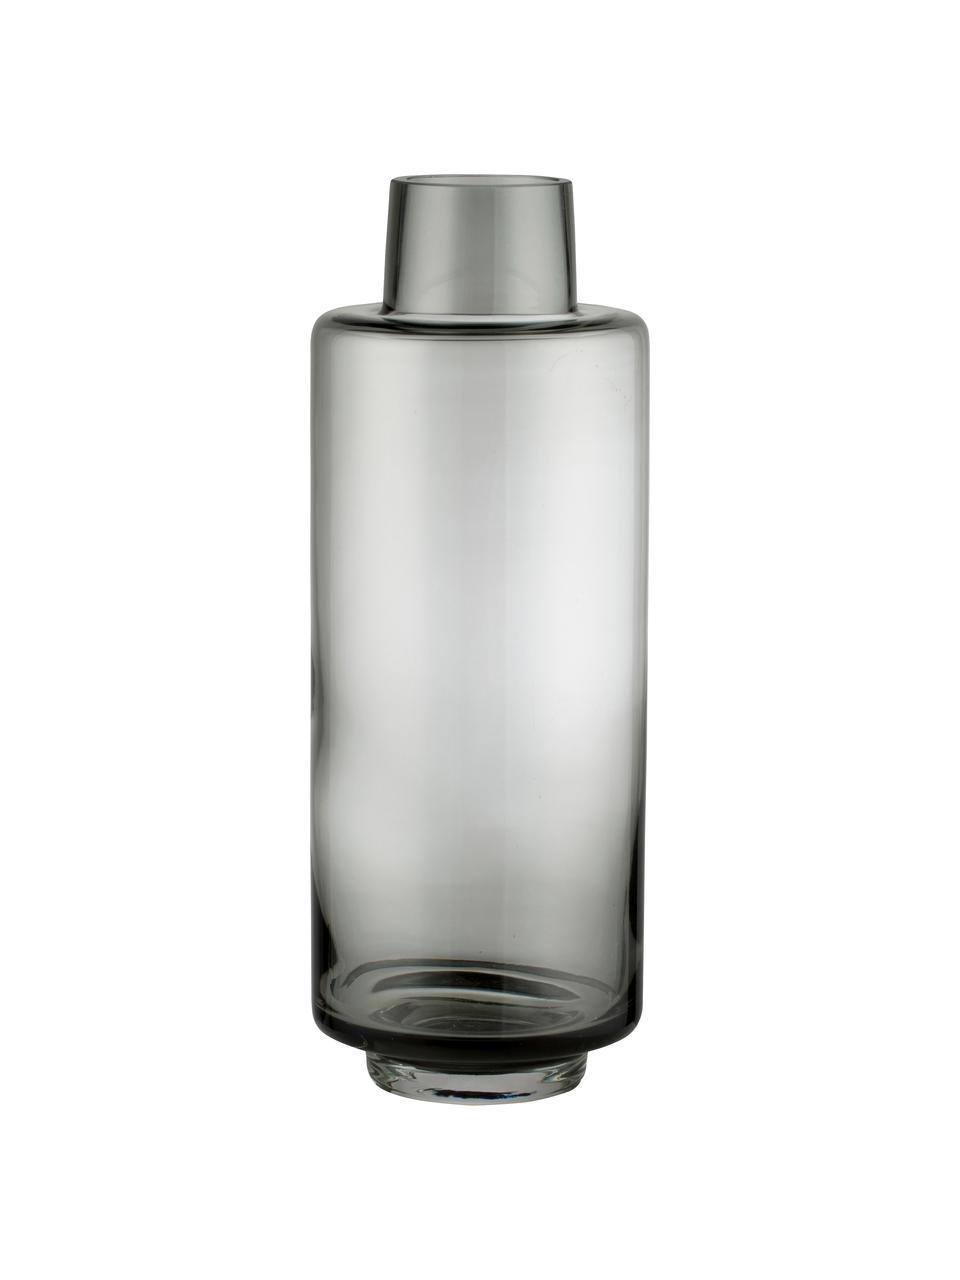 Große Mundgeblasene Vase Hedria, Glas, Rauchgrau, Ø 11 x H 30 cm